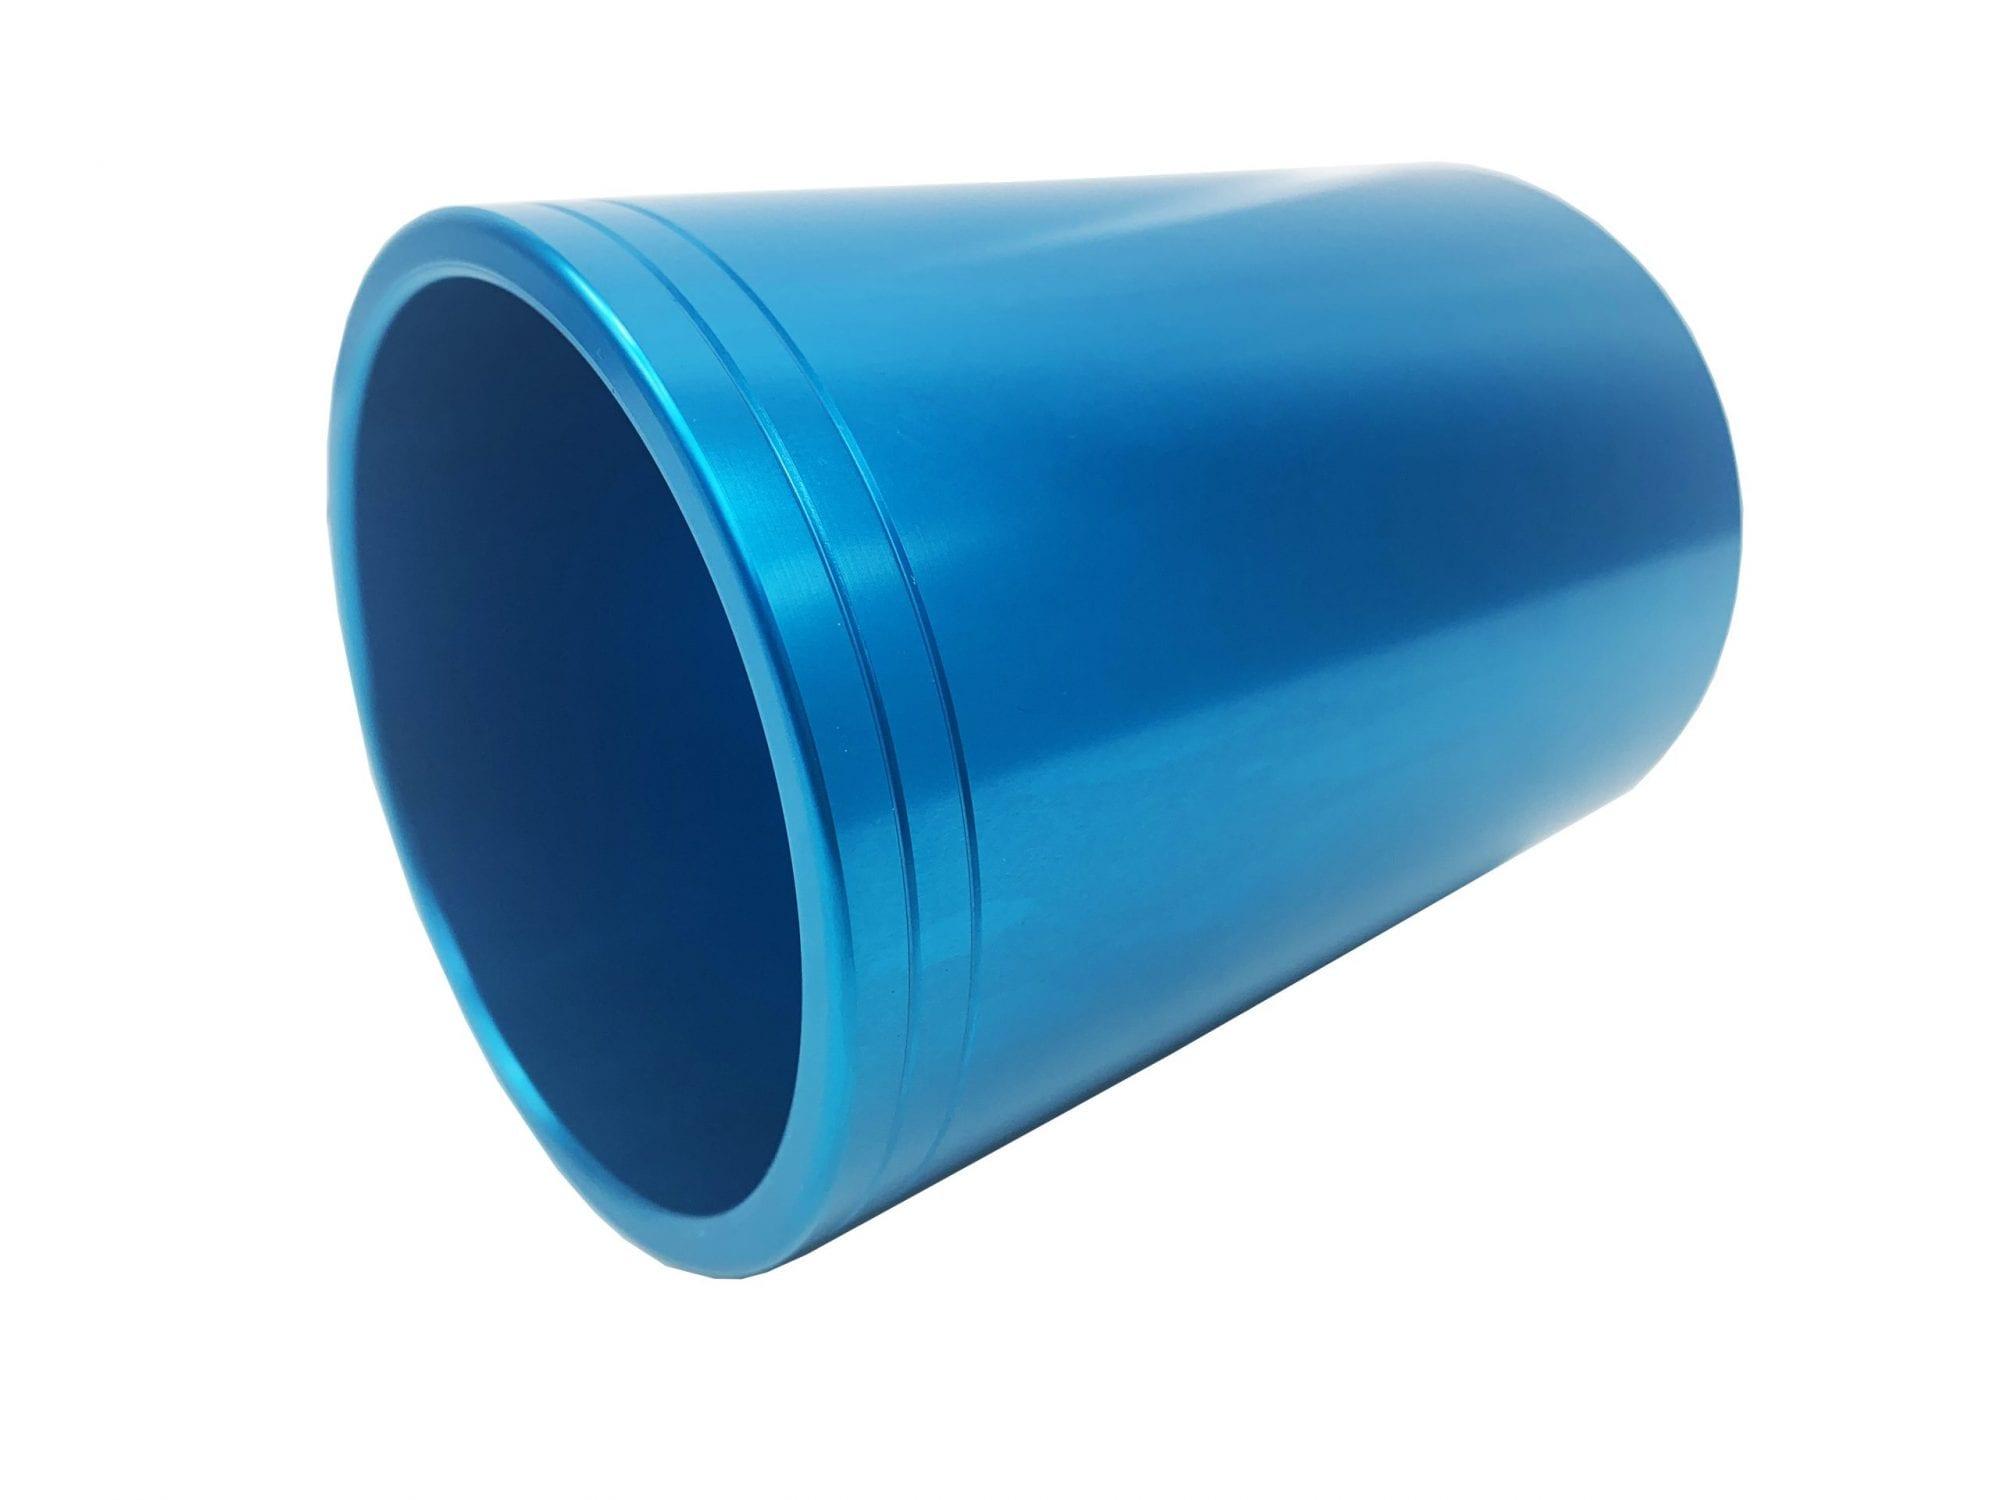 Polymer Plastic Mug Metal Insert Jig For 14oz Travel Mug Heat Press Sublimatio Ebay